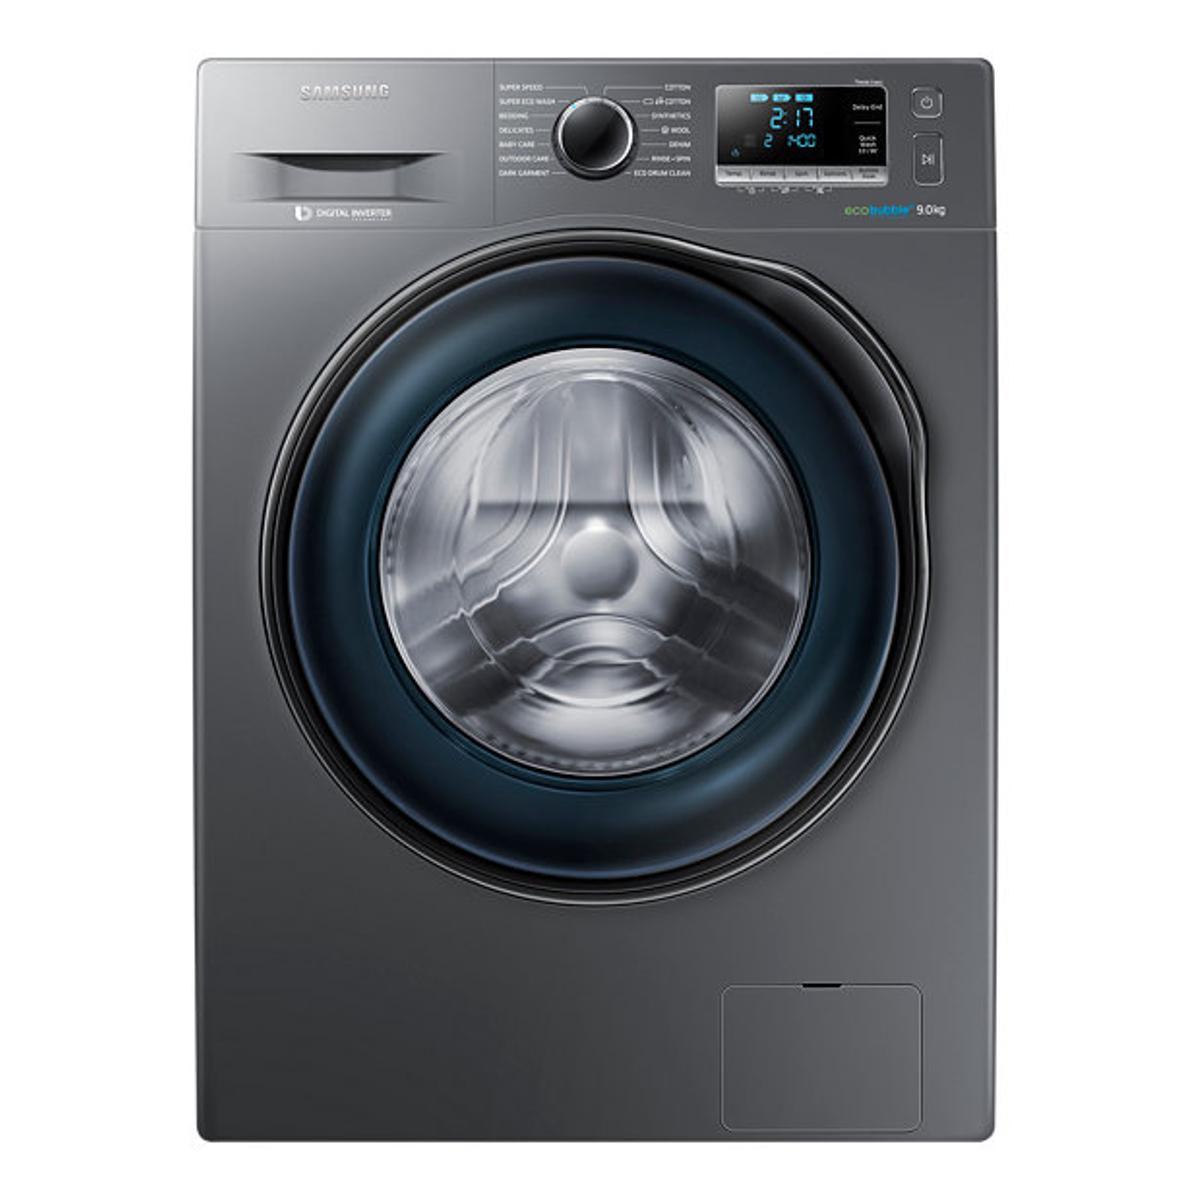 Samsung WW90J6410CX 9KG 1400RPM Washing Machine with 5 year warranty £409 with code @ Hughes